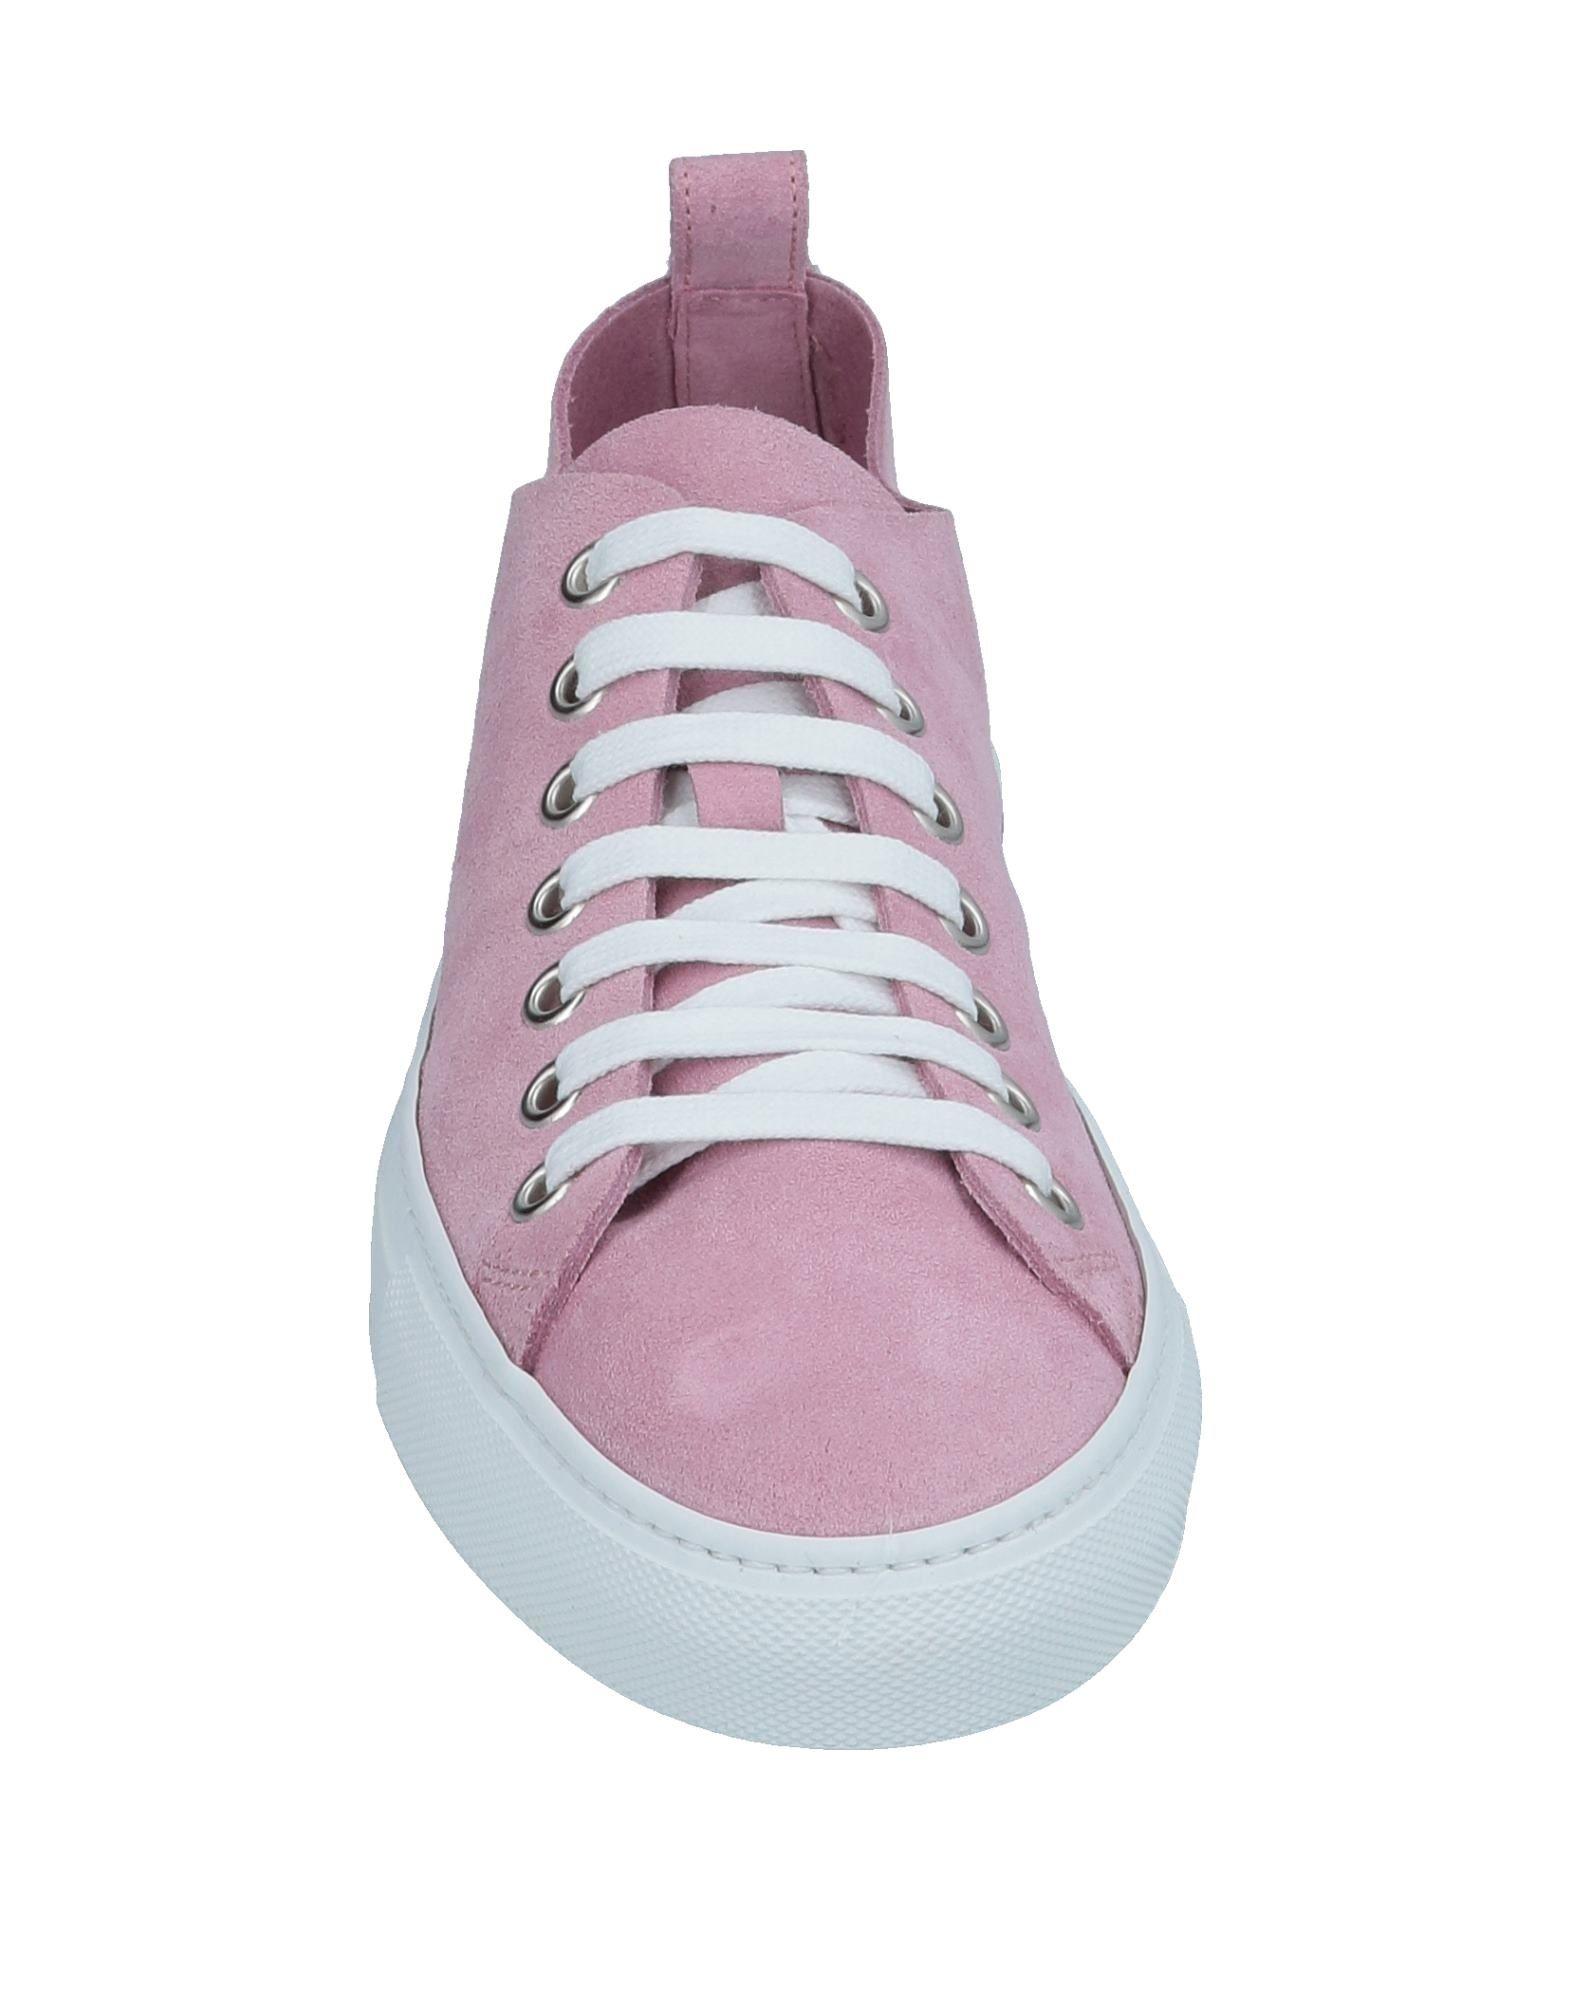 Dsquared2  Sneakers Damen  Dsquared2 11560270PRGut aussehende strapazierfähige Schuhe 571499